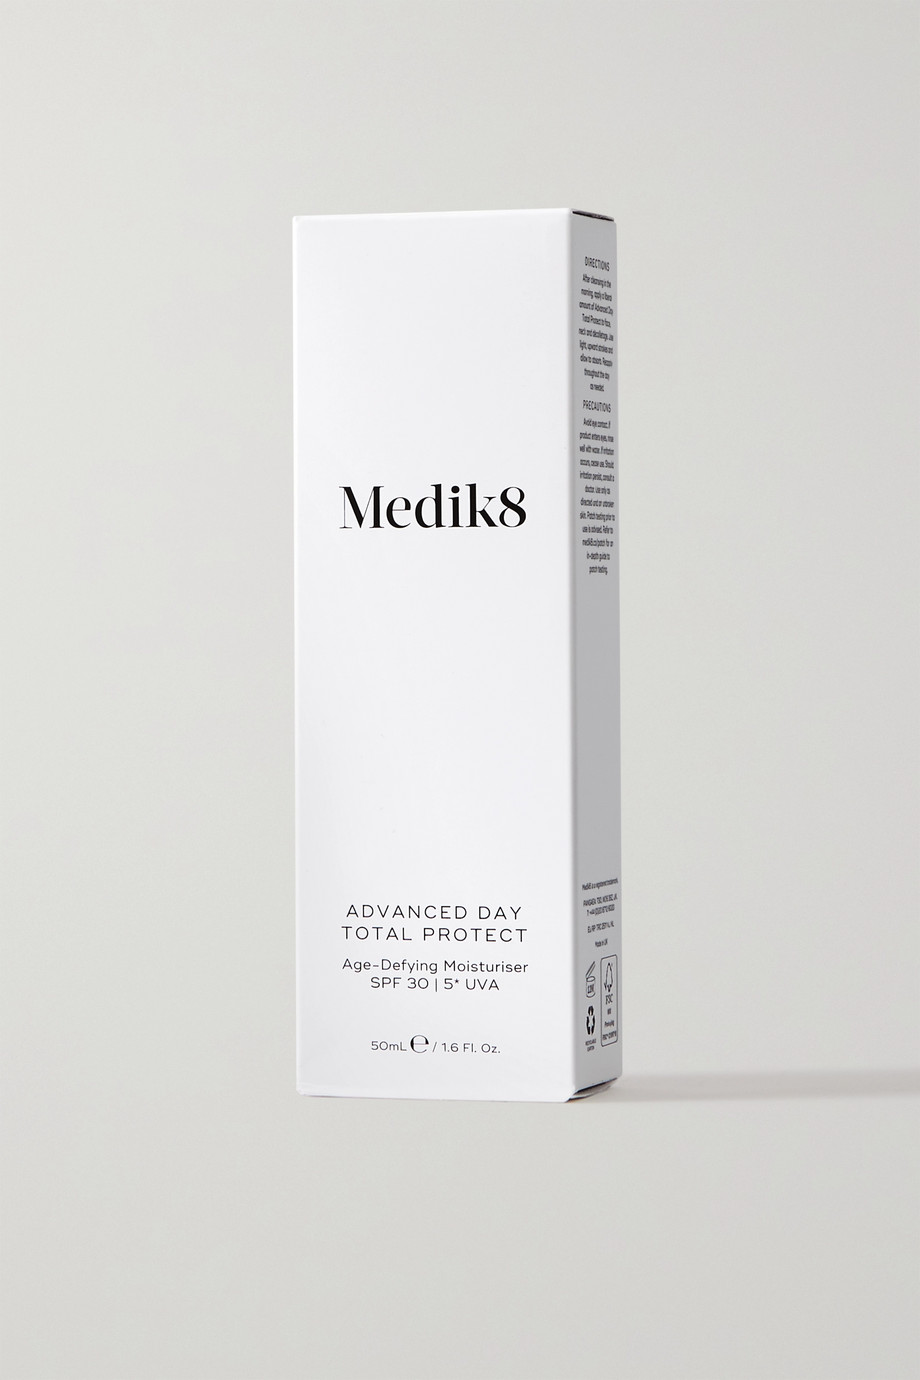 Medik8 Advanced Day Total Protect™ Age Defying Moisturiser LSF 30, 50 ml – Feuchtigkeitspflege